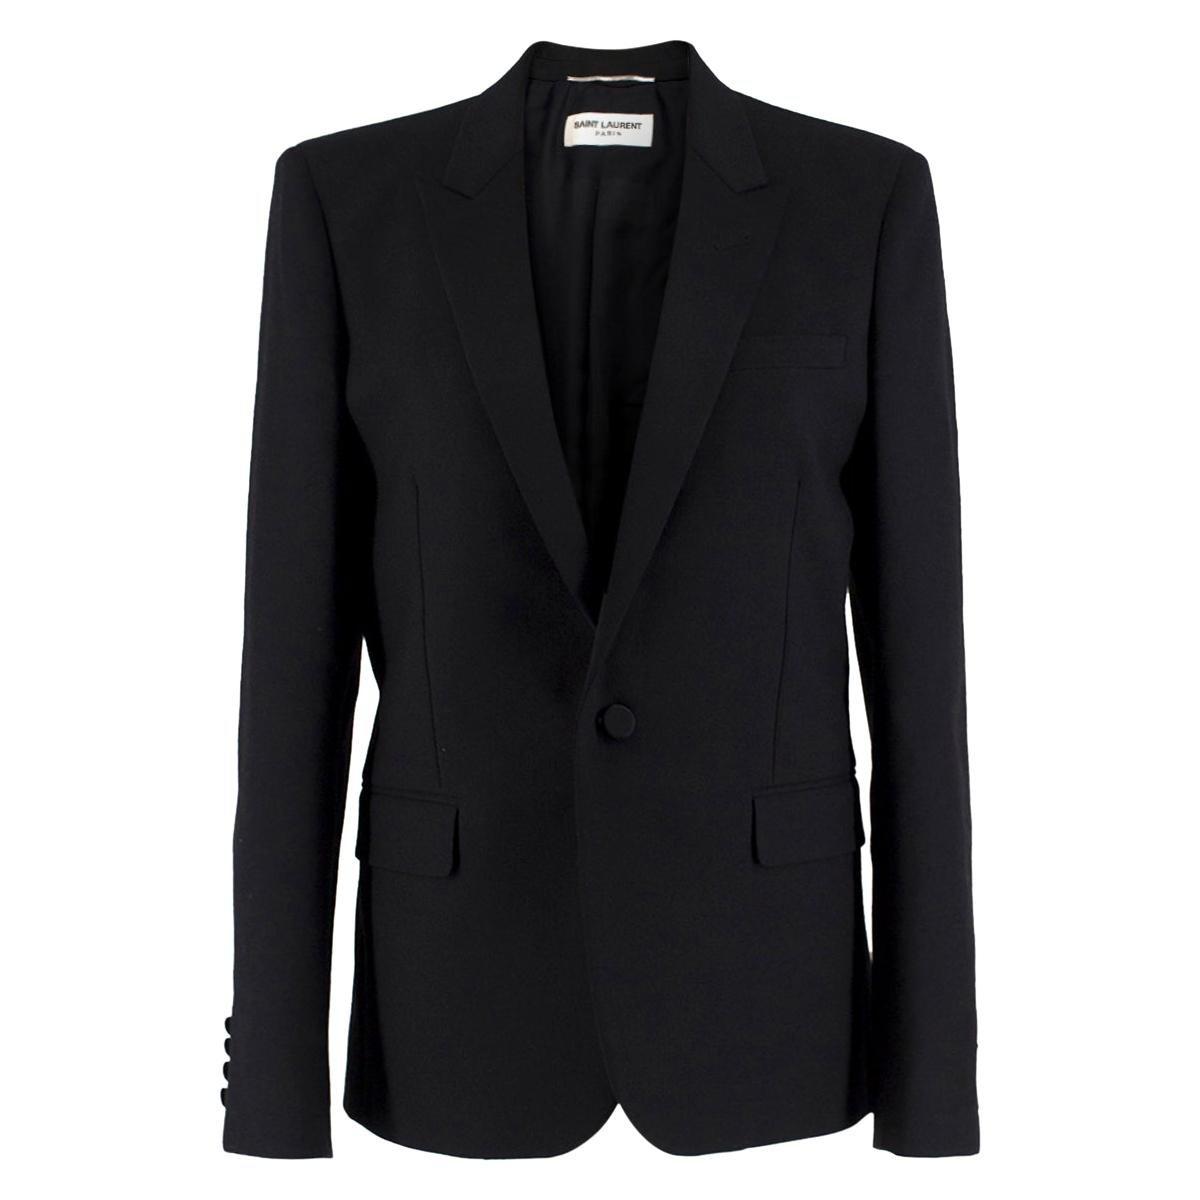 Saint Laurent Virgin Wool Le Smoking Jacket Size US 10